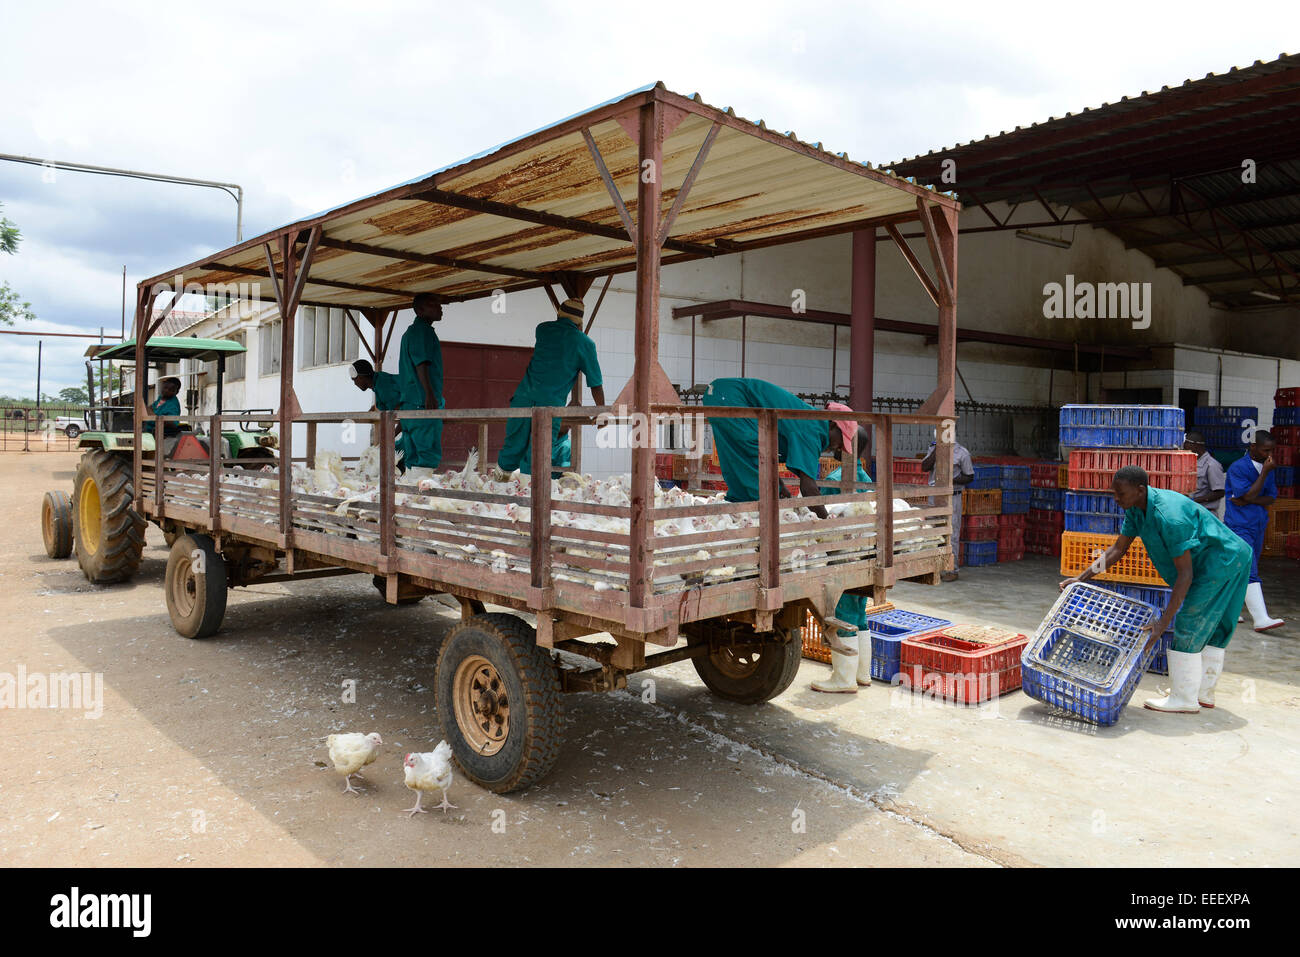 MOZAMBIQUE, Chimoio, chicken farm and slaughterhouse Agro-Pecuaria Abilio Antunes, processing of broiler at slaughterhouse - Stock Image